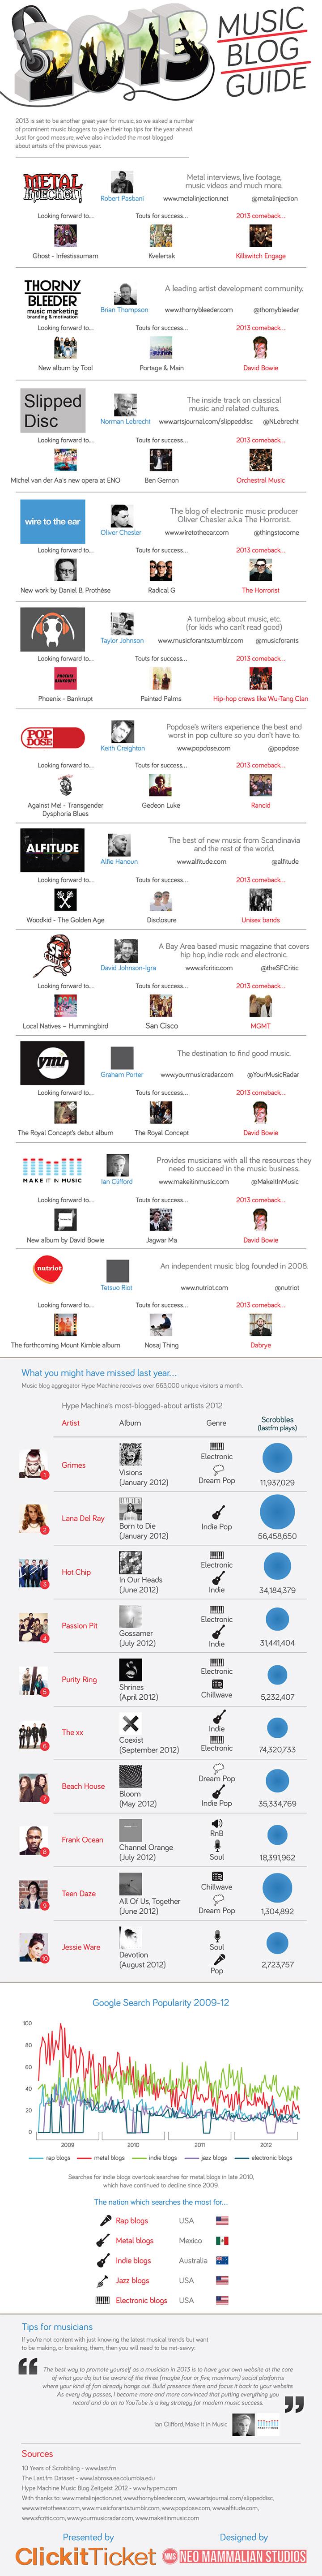 Music Blog Guide - ClickitTicket.com